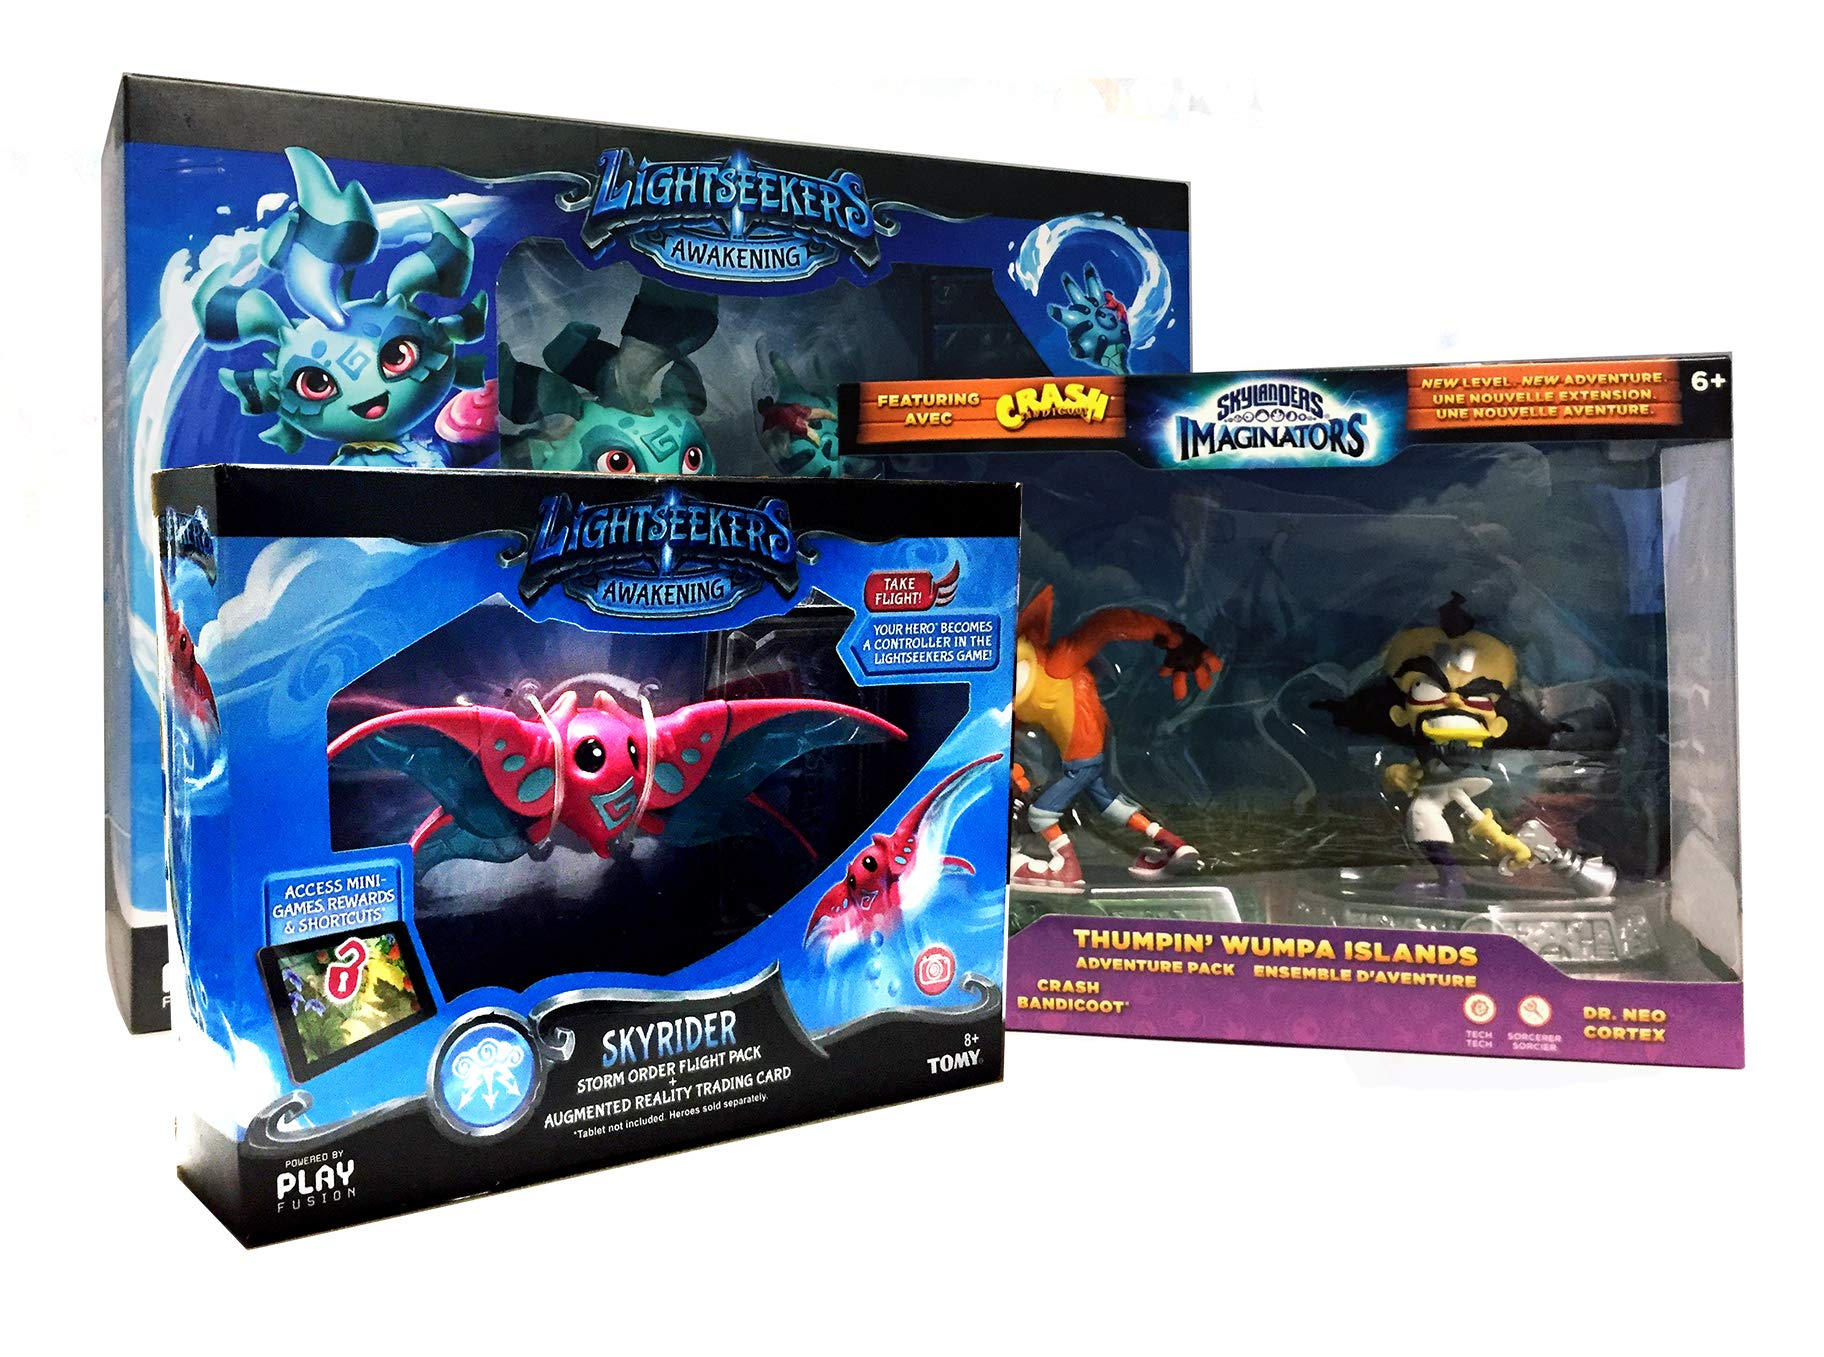 Awakening Mari Starter Pack Bundle with Skyrider and Thumpin Wumpa Islands Adventure Pack